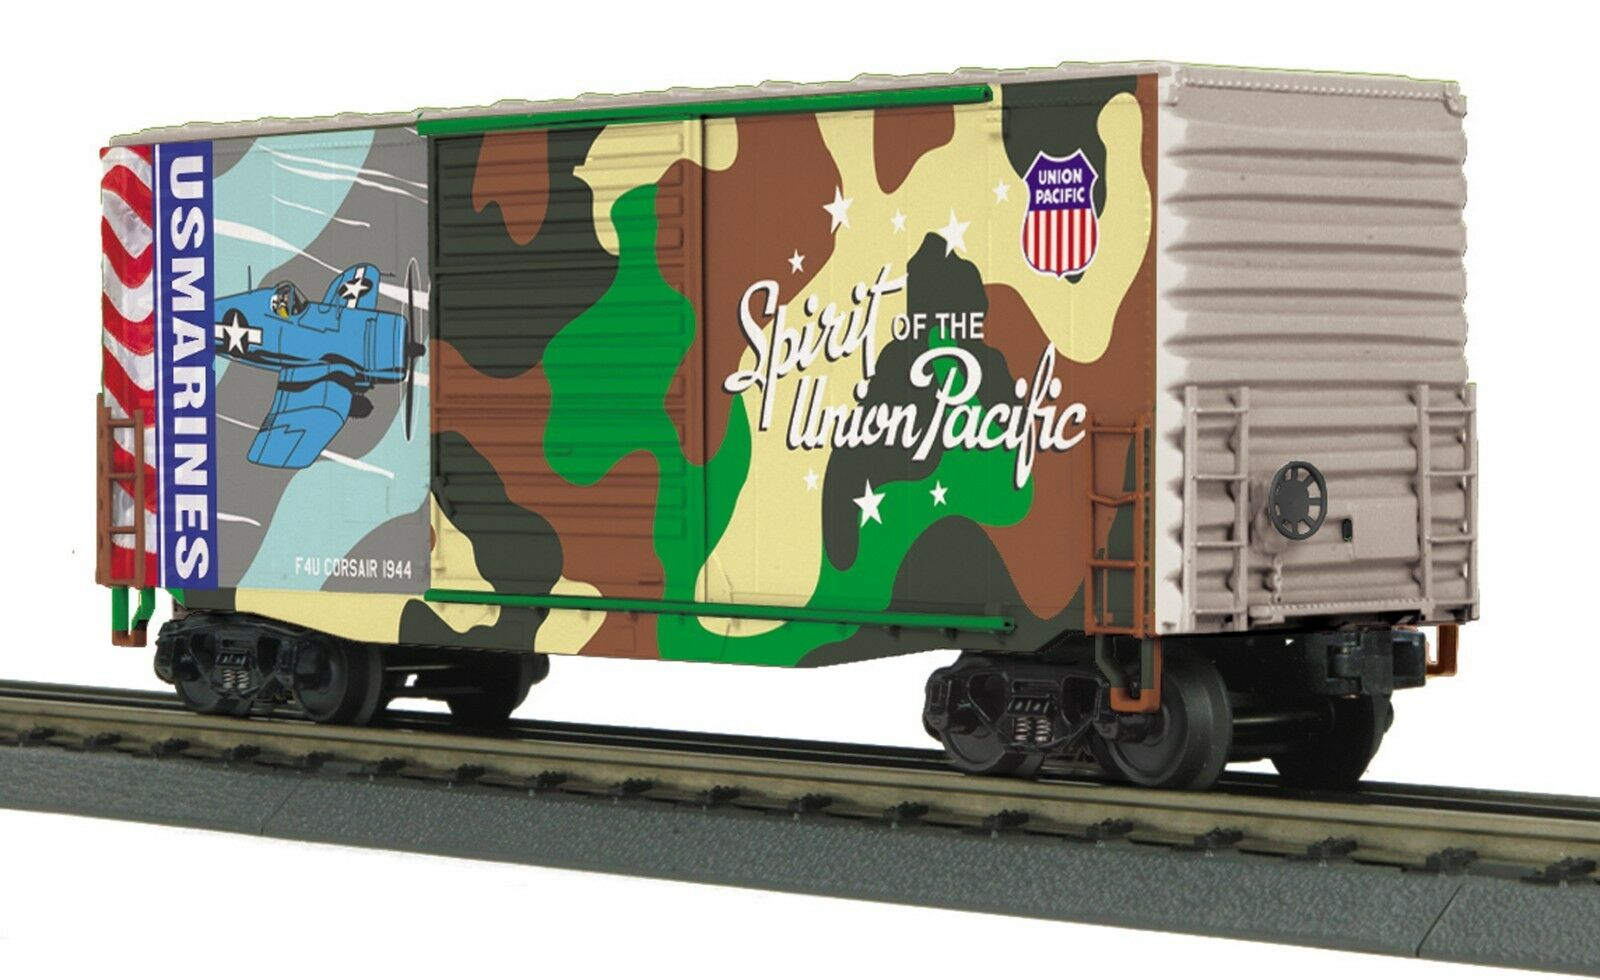 30-74926 Union Pacific (Marines - Spirit of Union Pacific) 40' High Cube Box Car